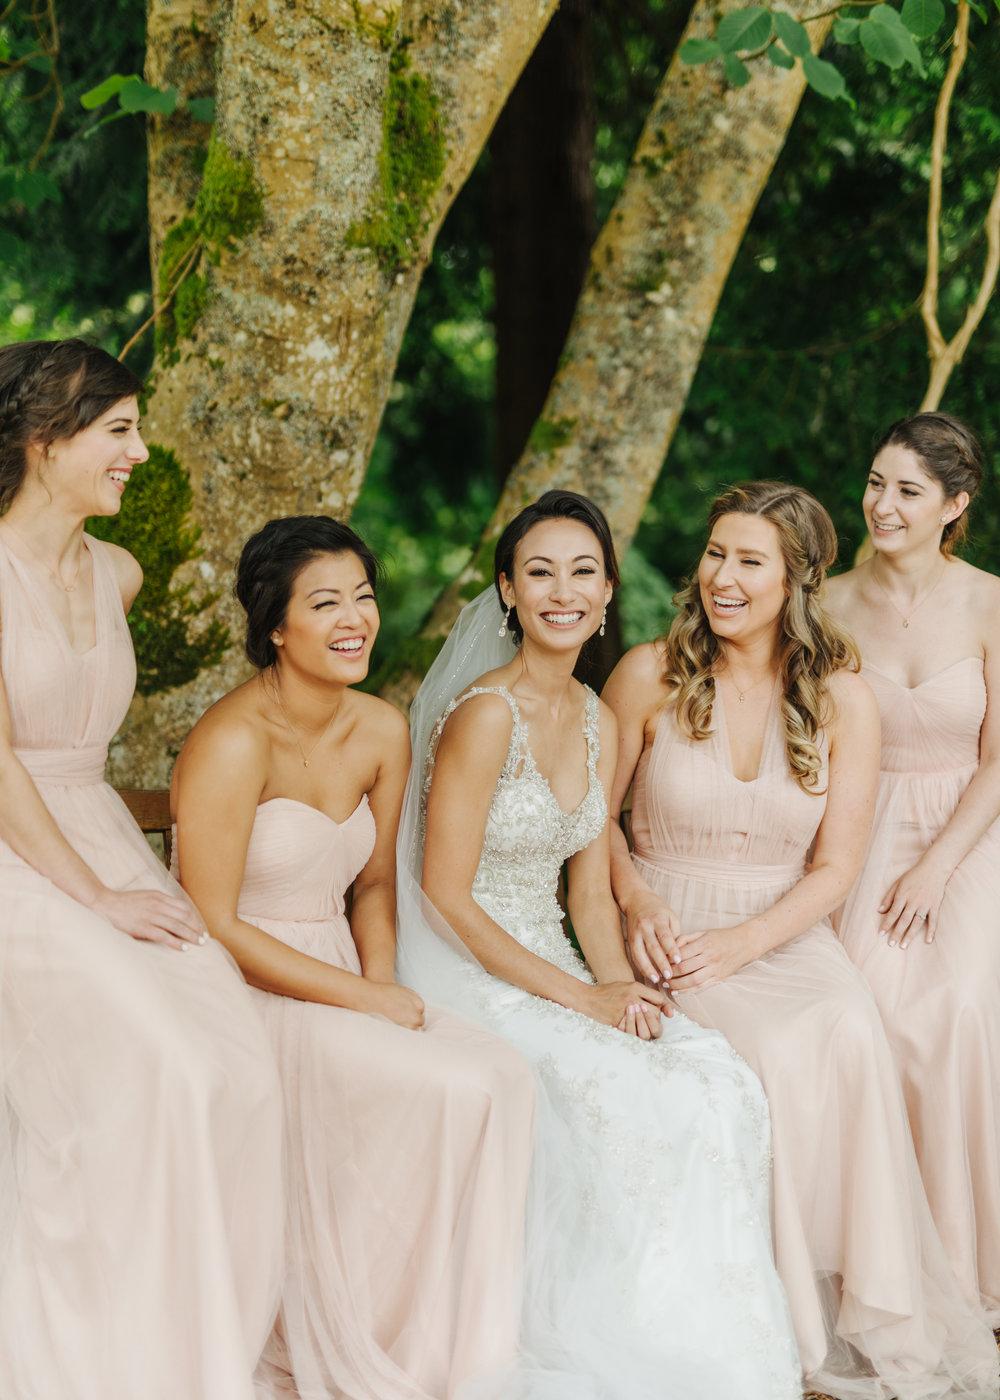 herafilms_wedding_jayne_connor_hera_selects-47.jpg